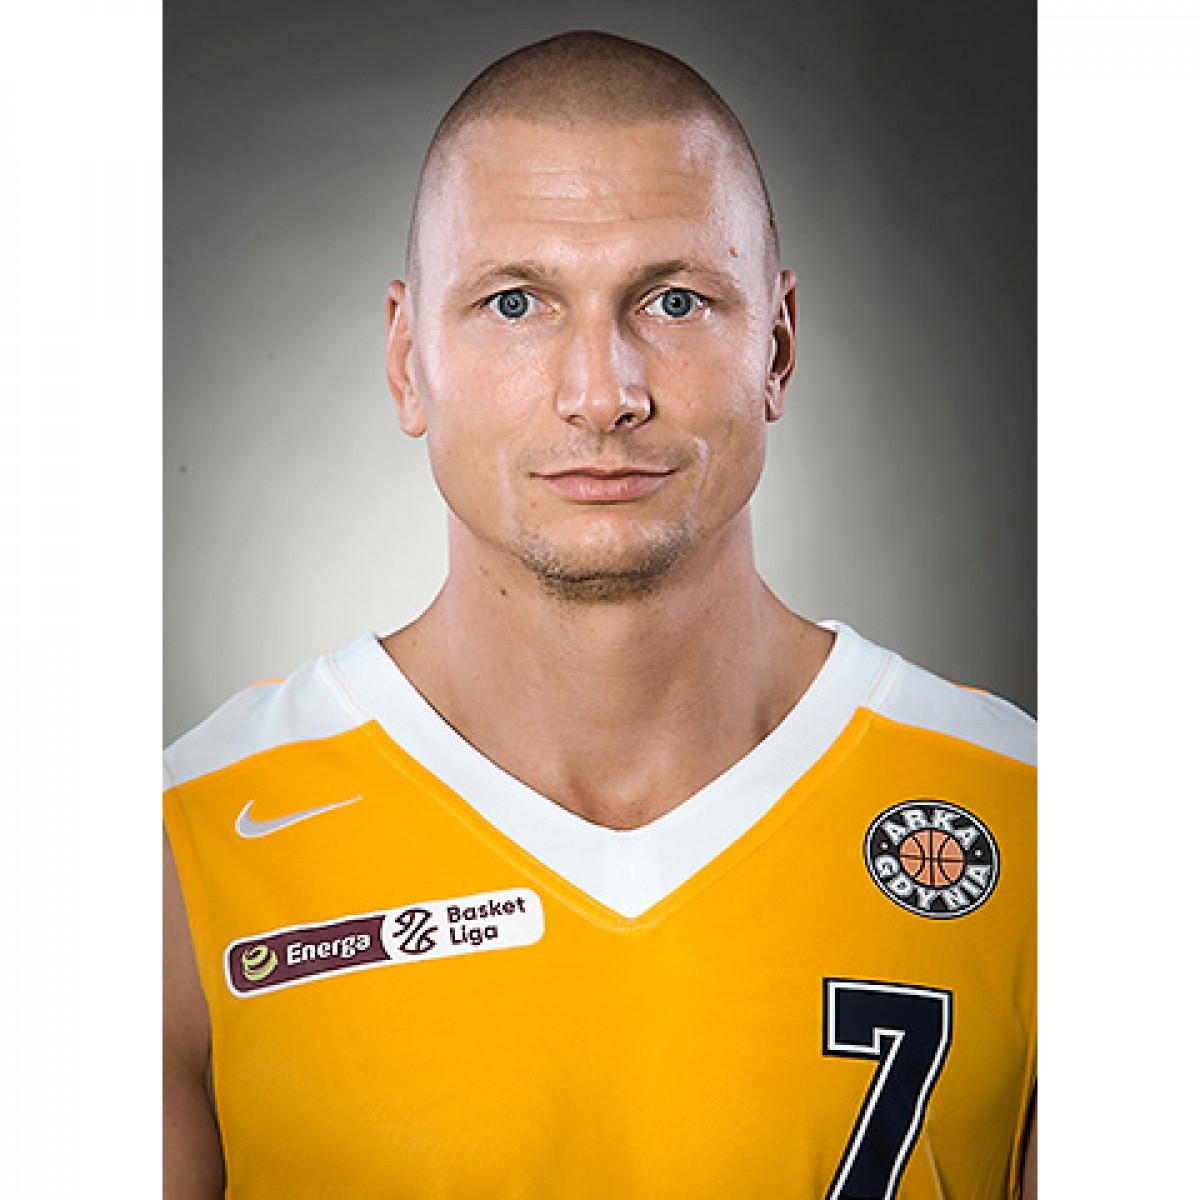 Photo of Krzysztof Szubarga, 2018-2019 season